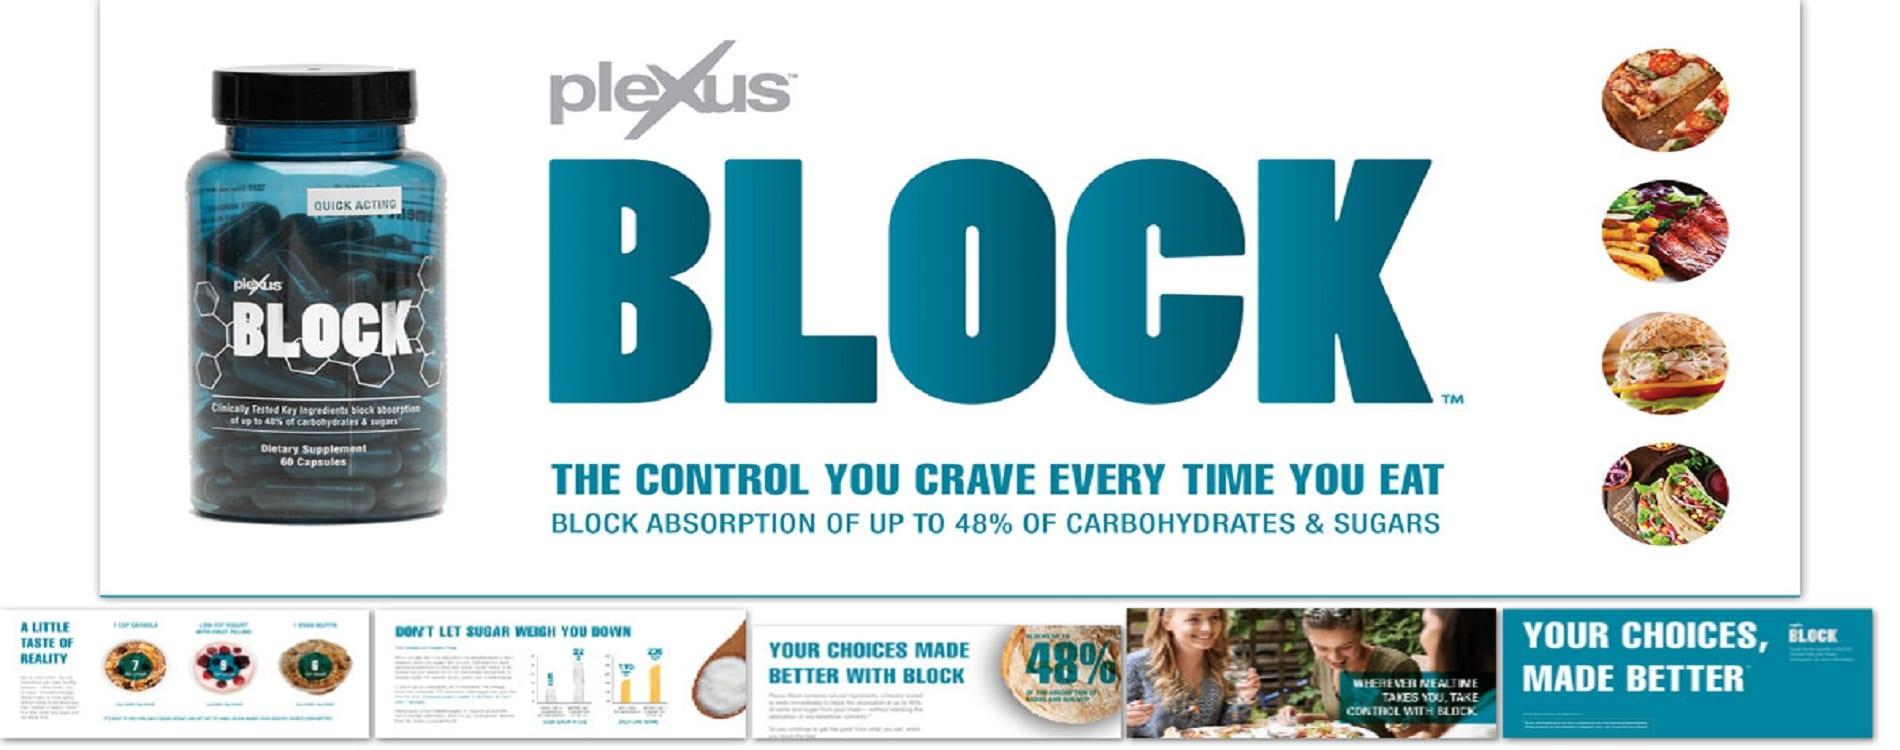 plexus block